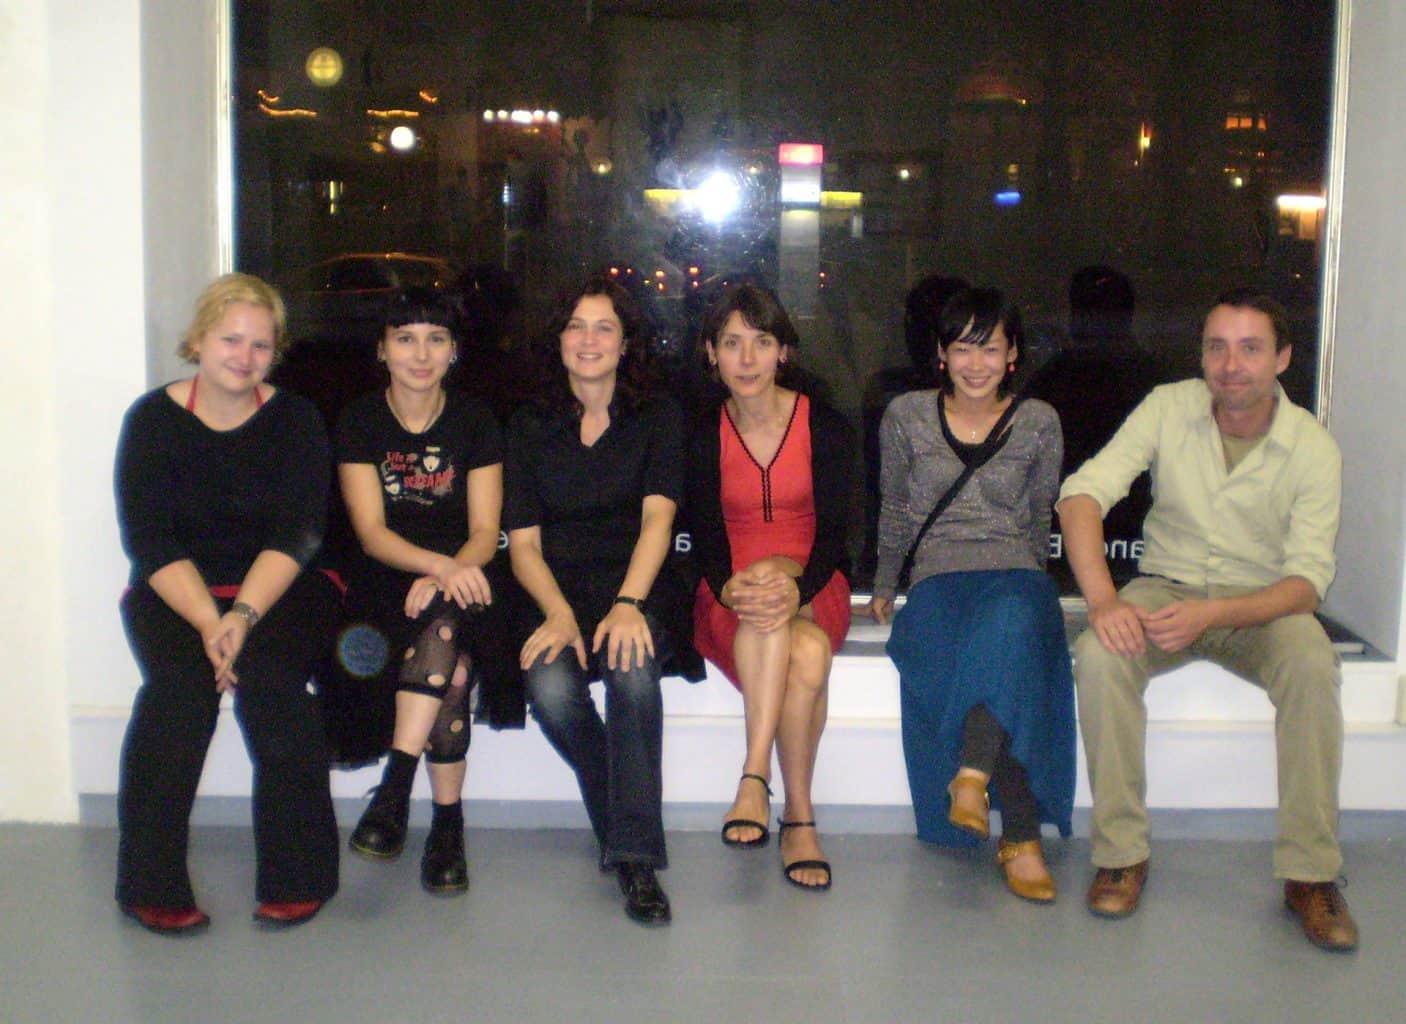 gruppenfoto-Michiko_Nakatani-Franca_Bartholomaei-Neudeli-Kunstraum-leipzig